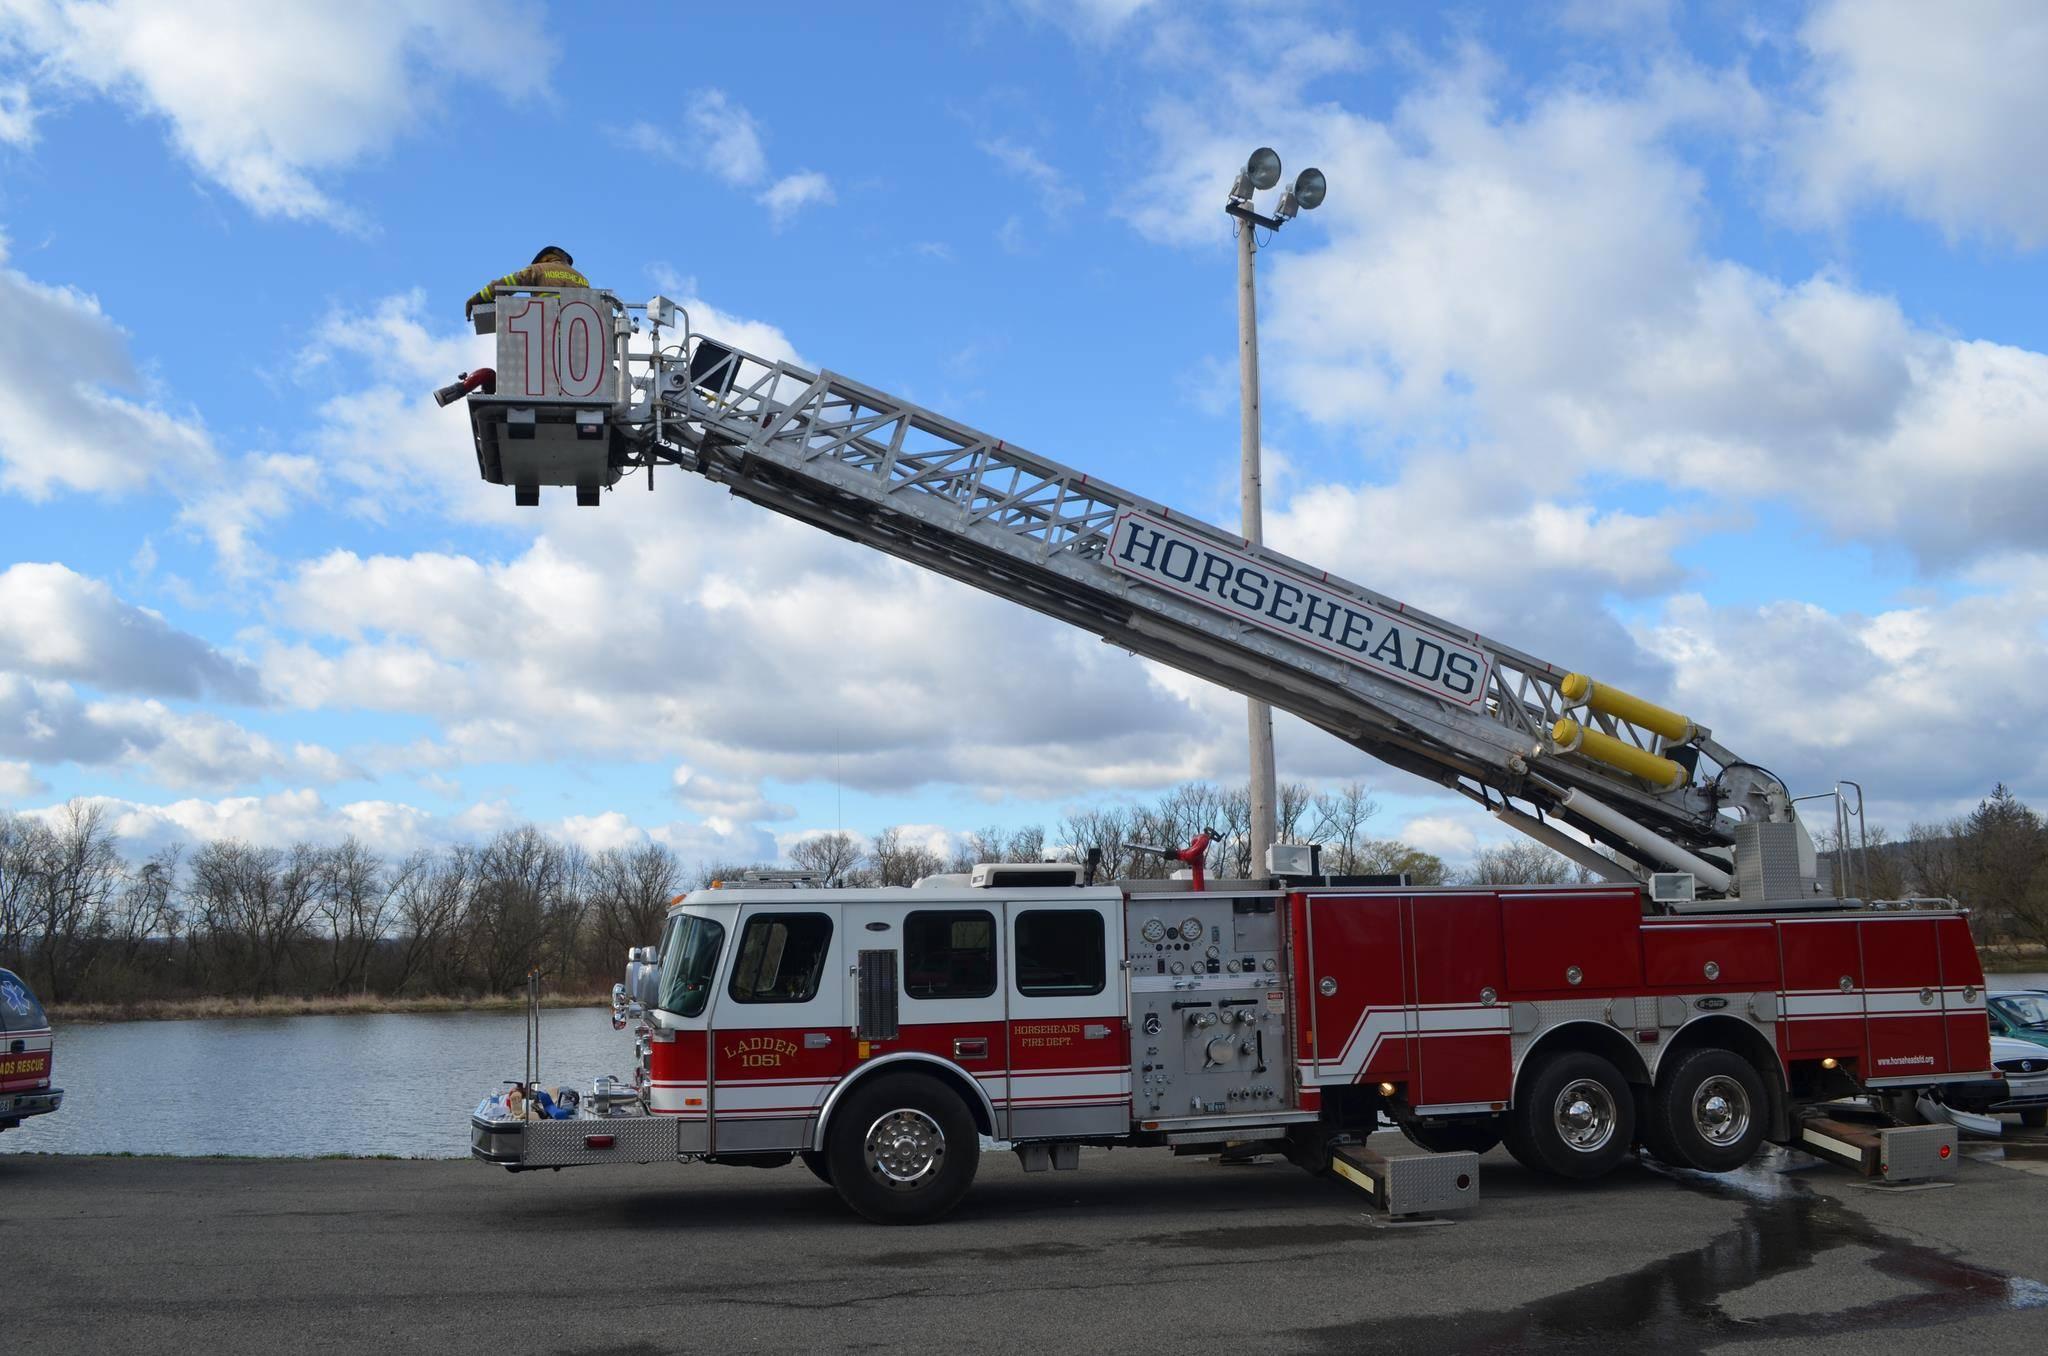 1051 - Ladder